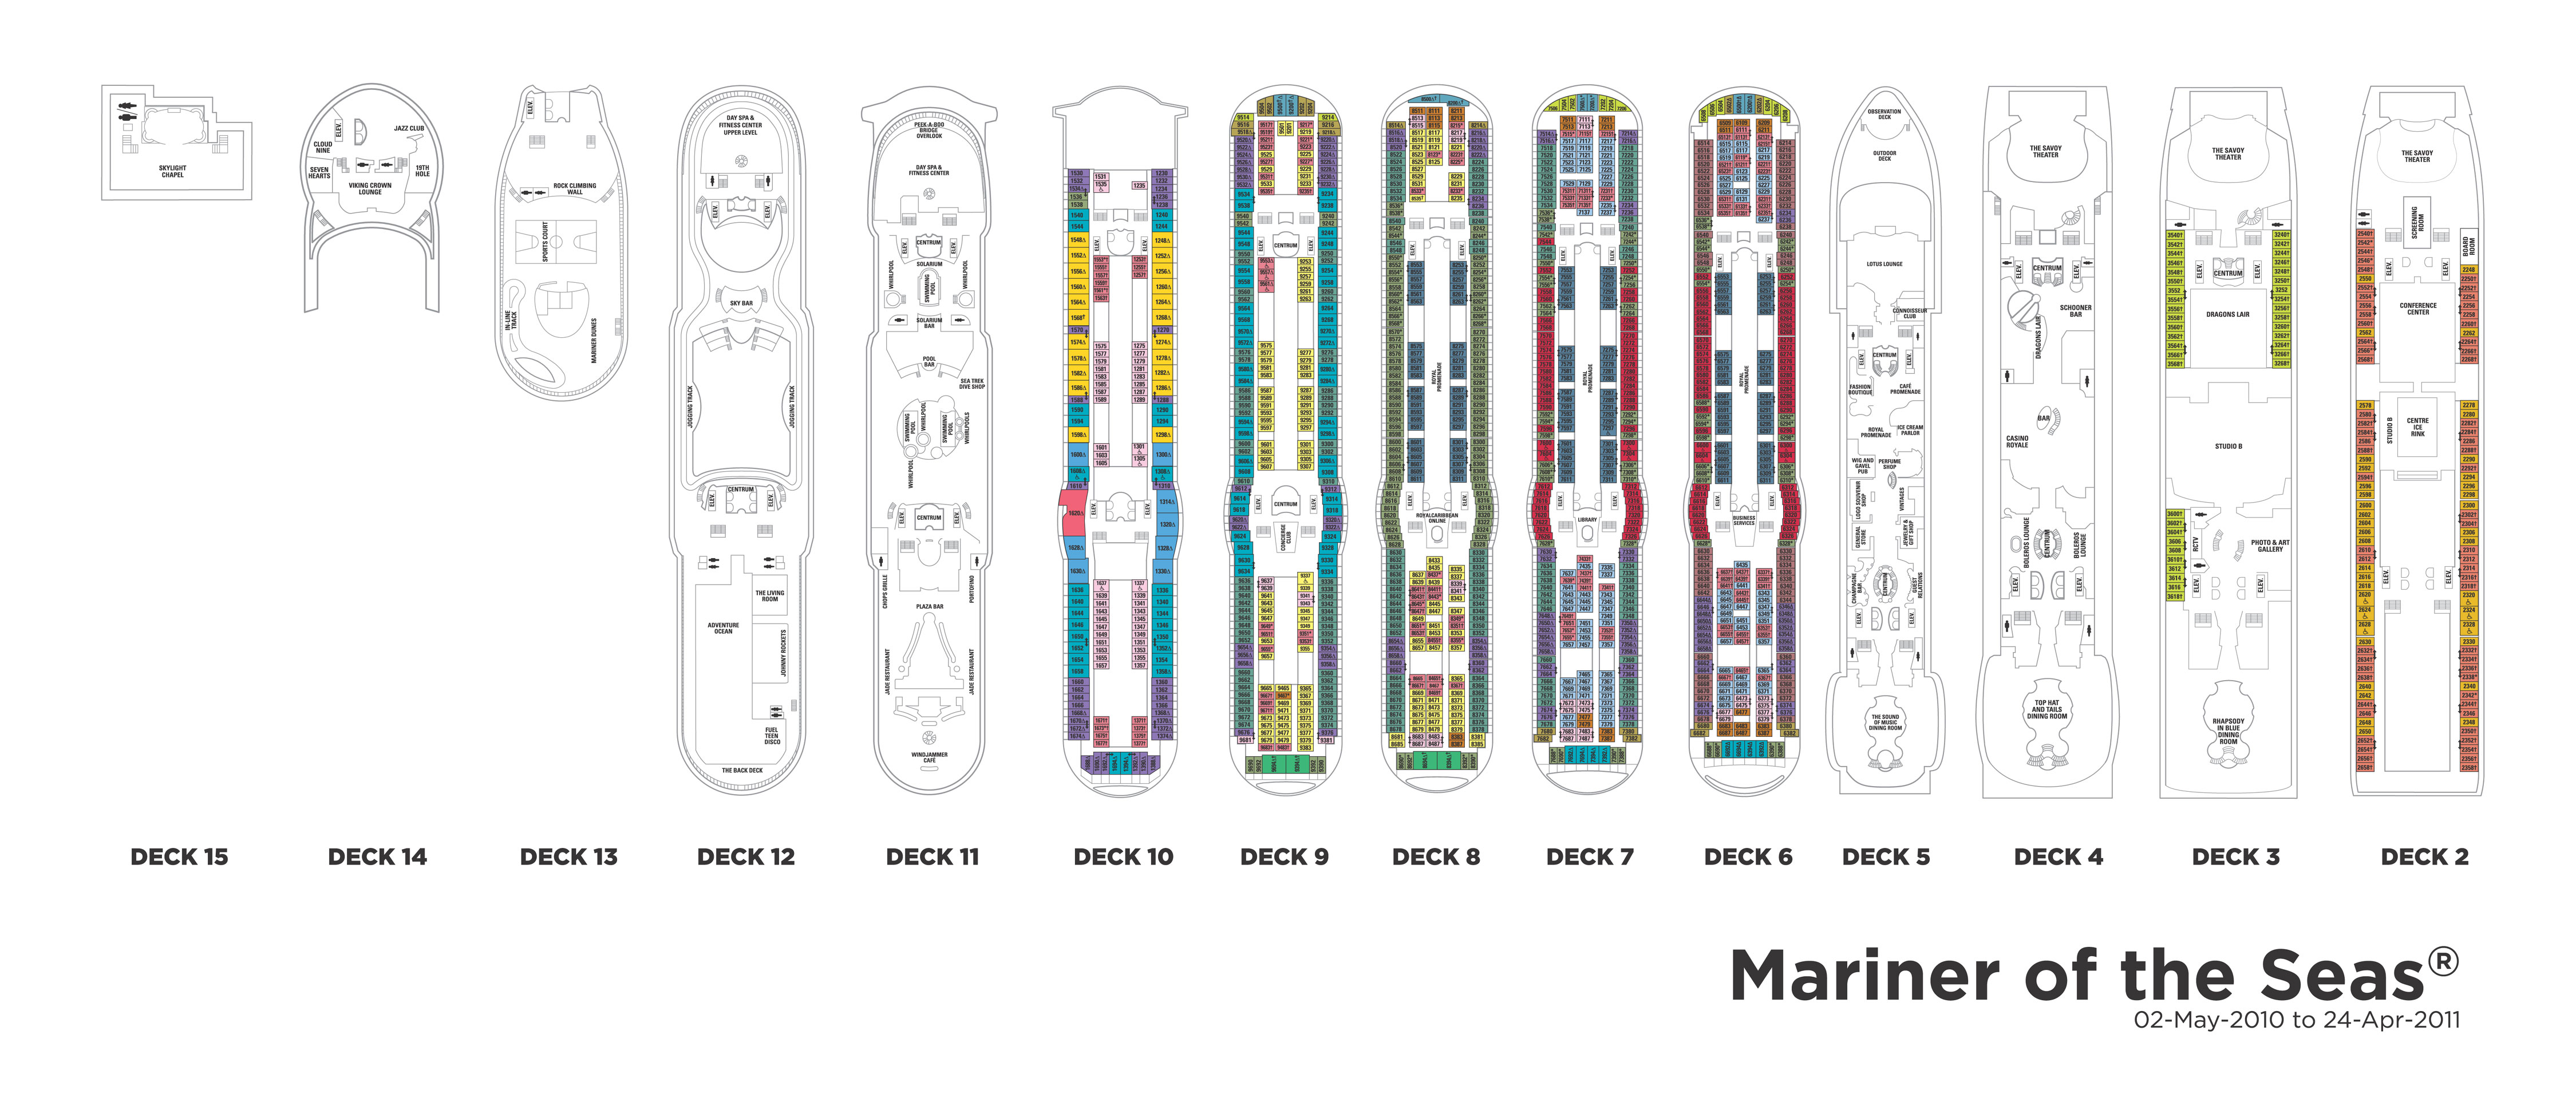 Royal Caribbean Mariner Of The Seas Deck Plan